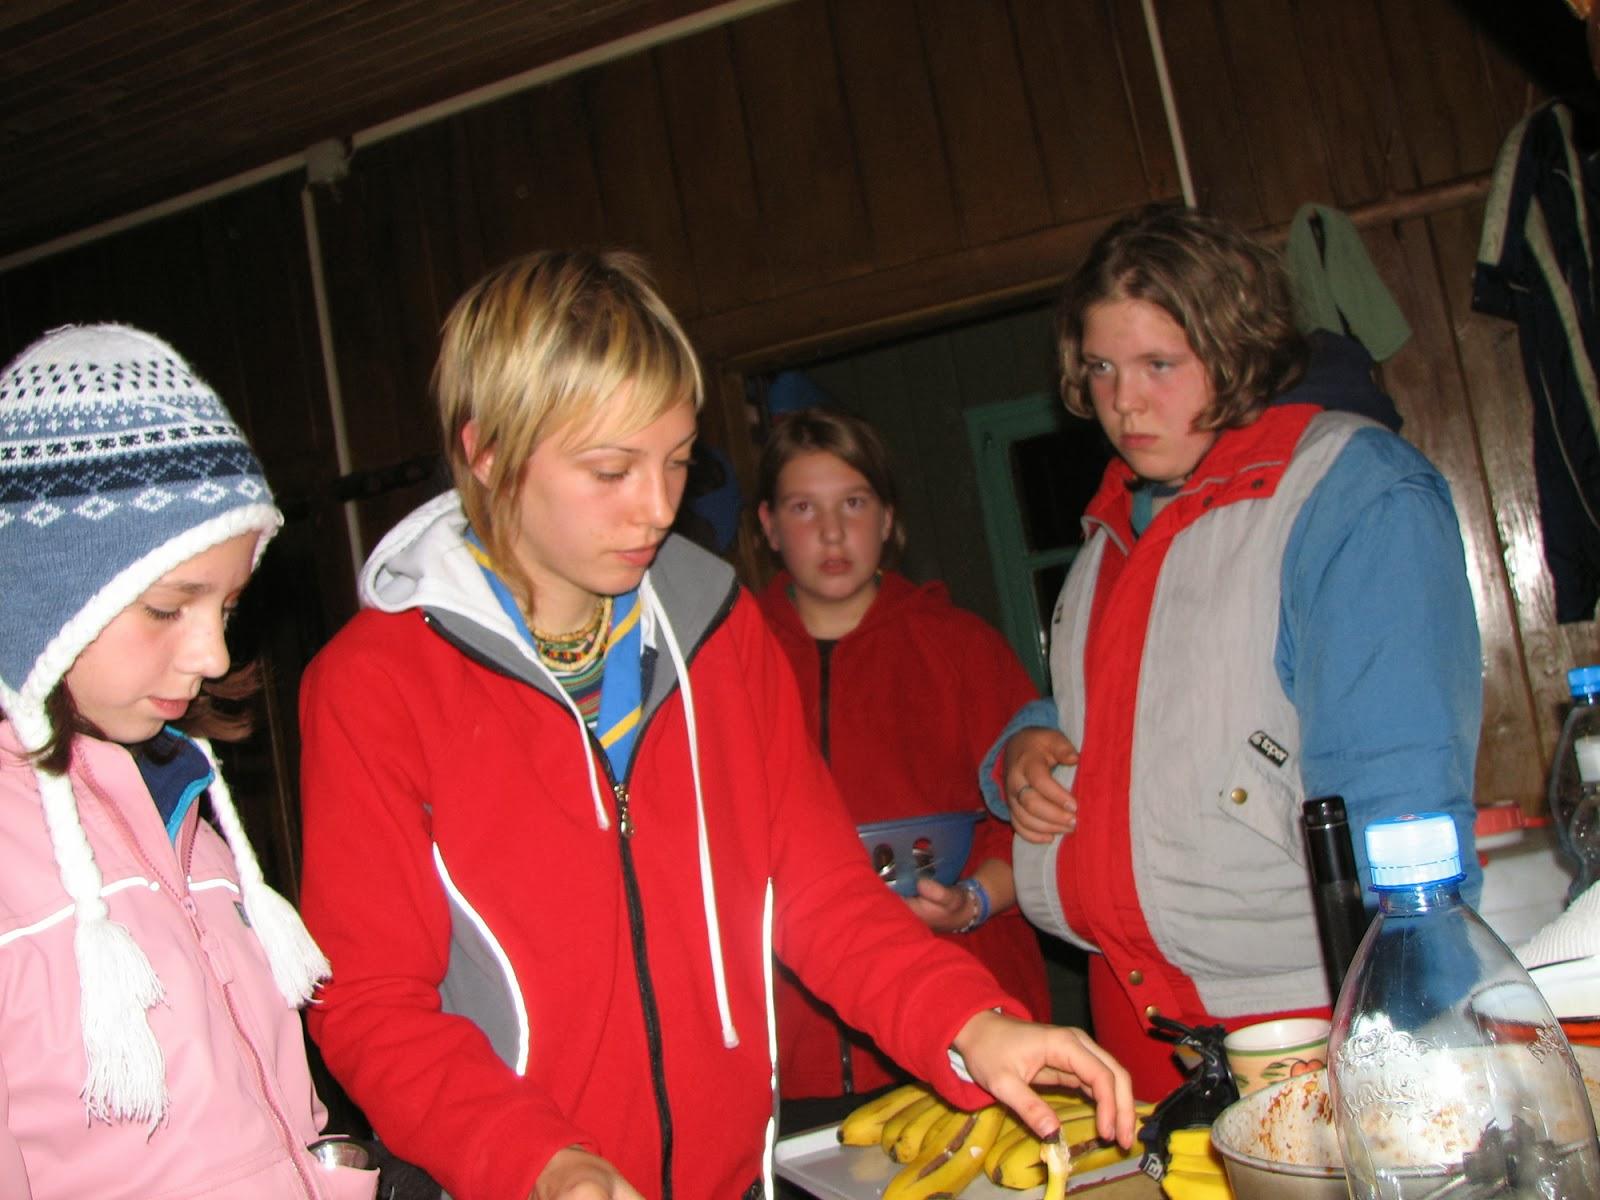 Vodov izlet, Ilirska Bistrica 2005 - Picture%2B273.jpg